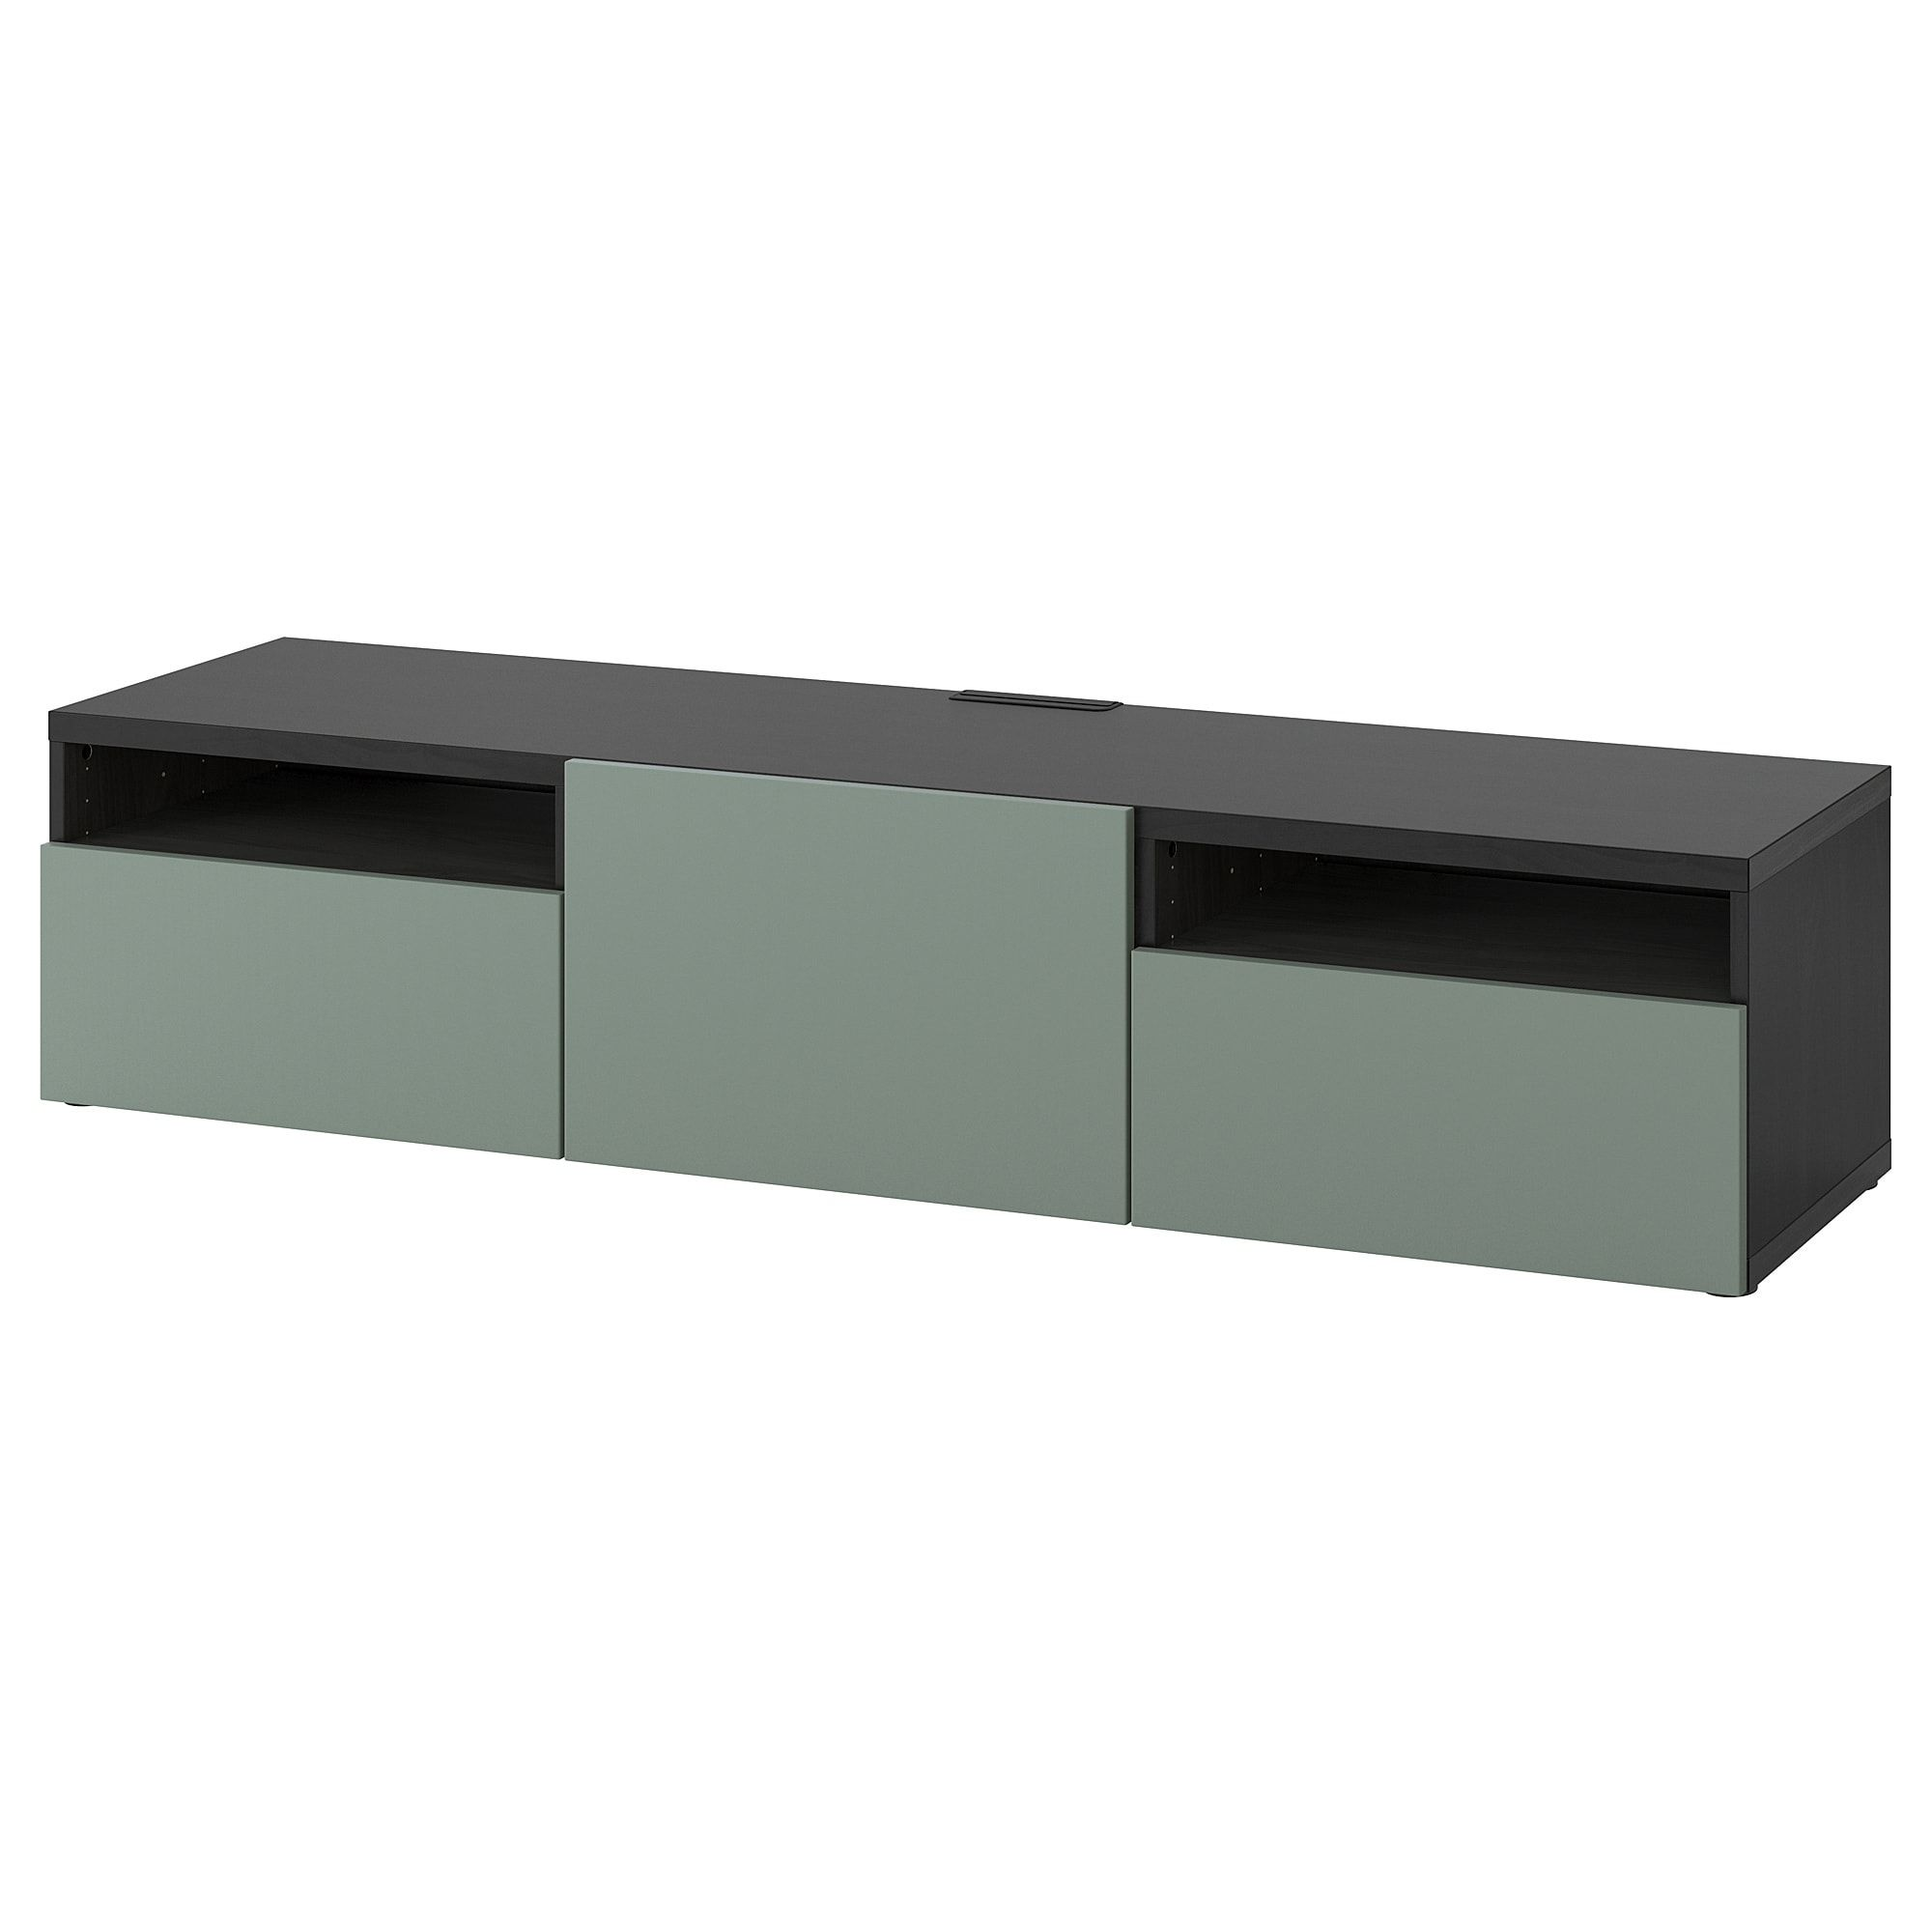 Besta Tv Unit Black Brown Notviken Gray Green 70 7 8x16 1 2x15 3 8 Order Today Ikea In 2020 Tv Bench Tv Unit Ikea